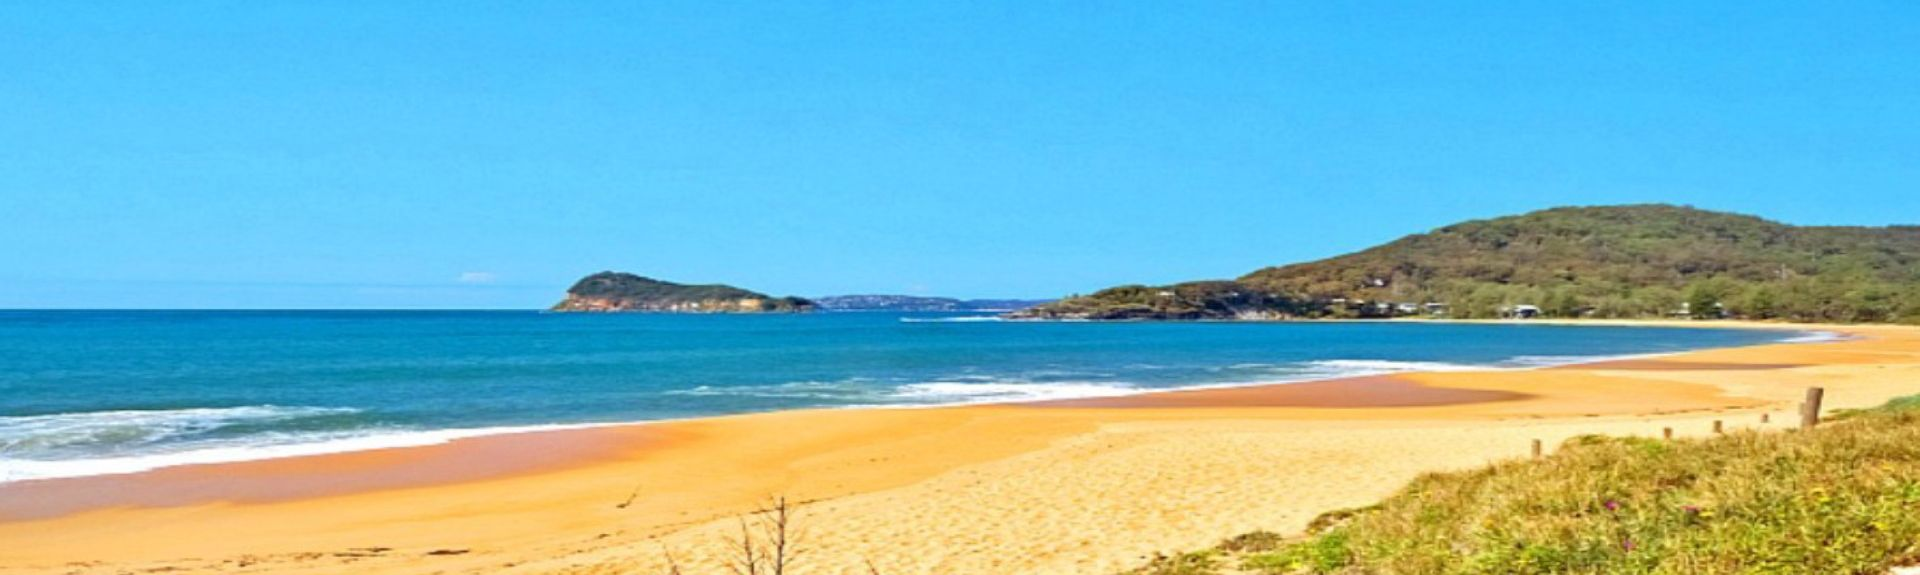 Ettalong Beach NSW, Australia